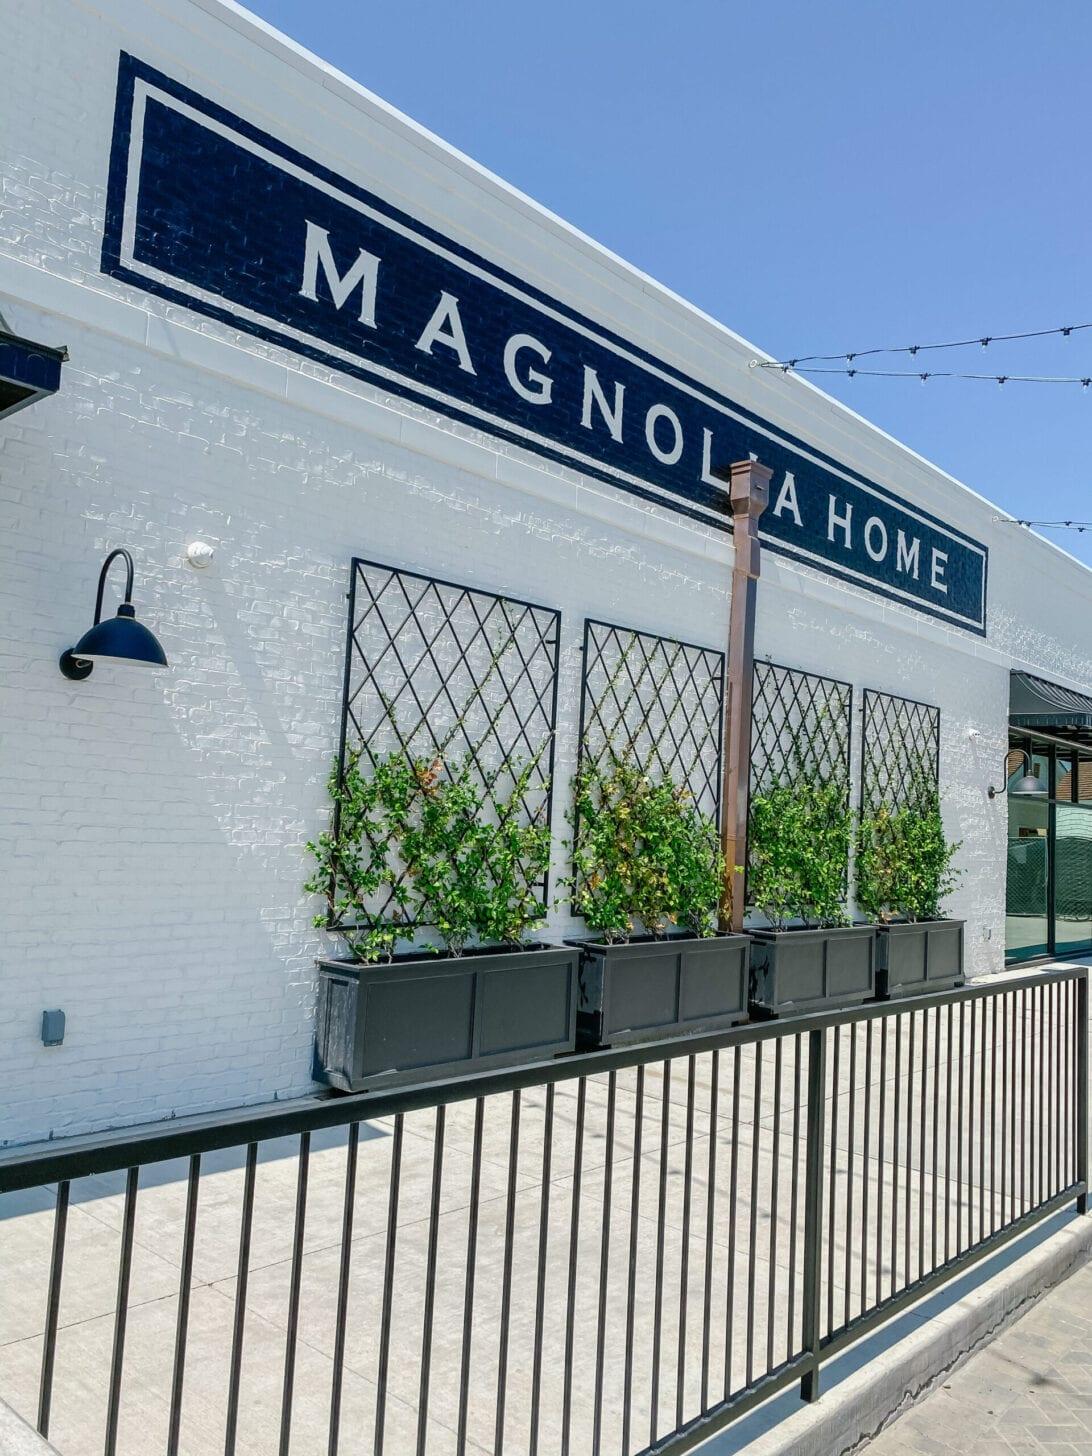 Magnolia Home, Magnolia Market